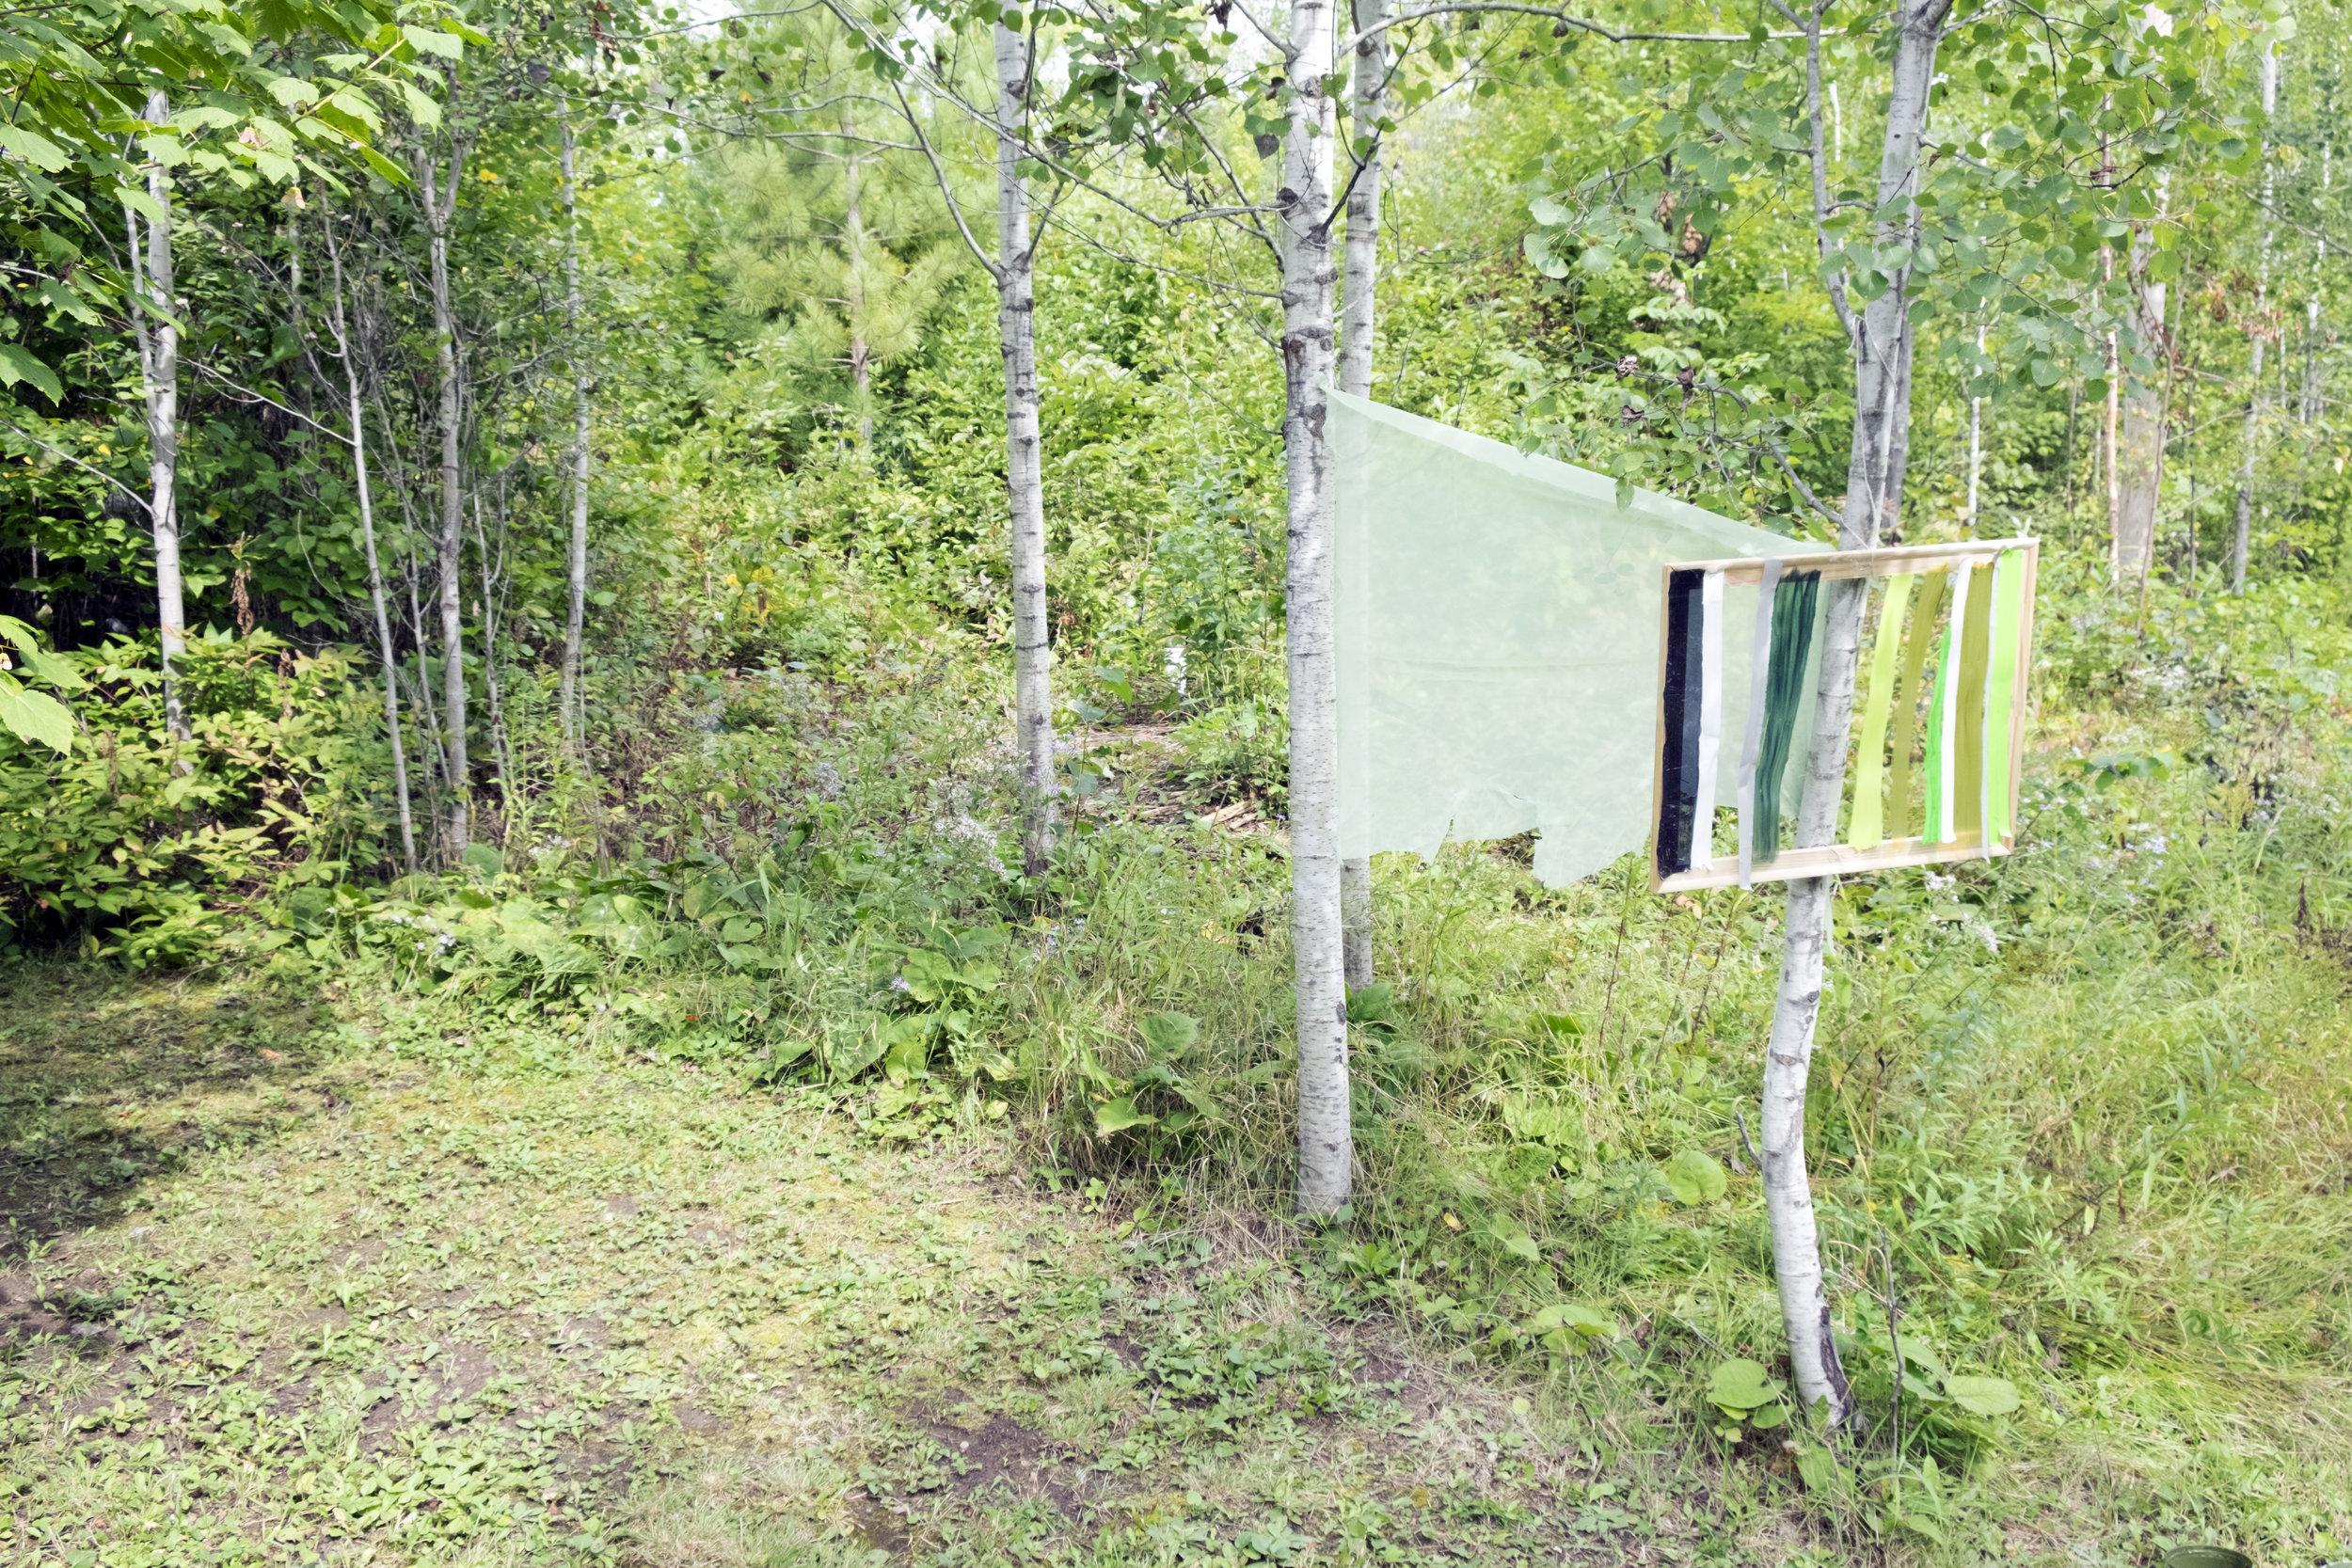 09.07.16 Reveal: Tofte Lake (Birch)